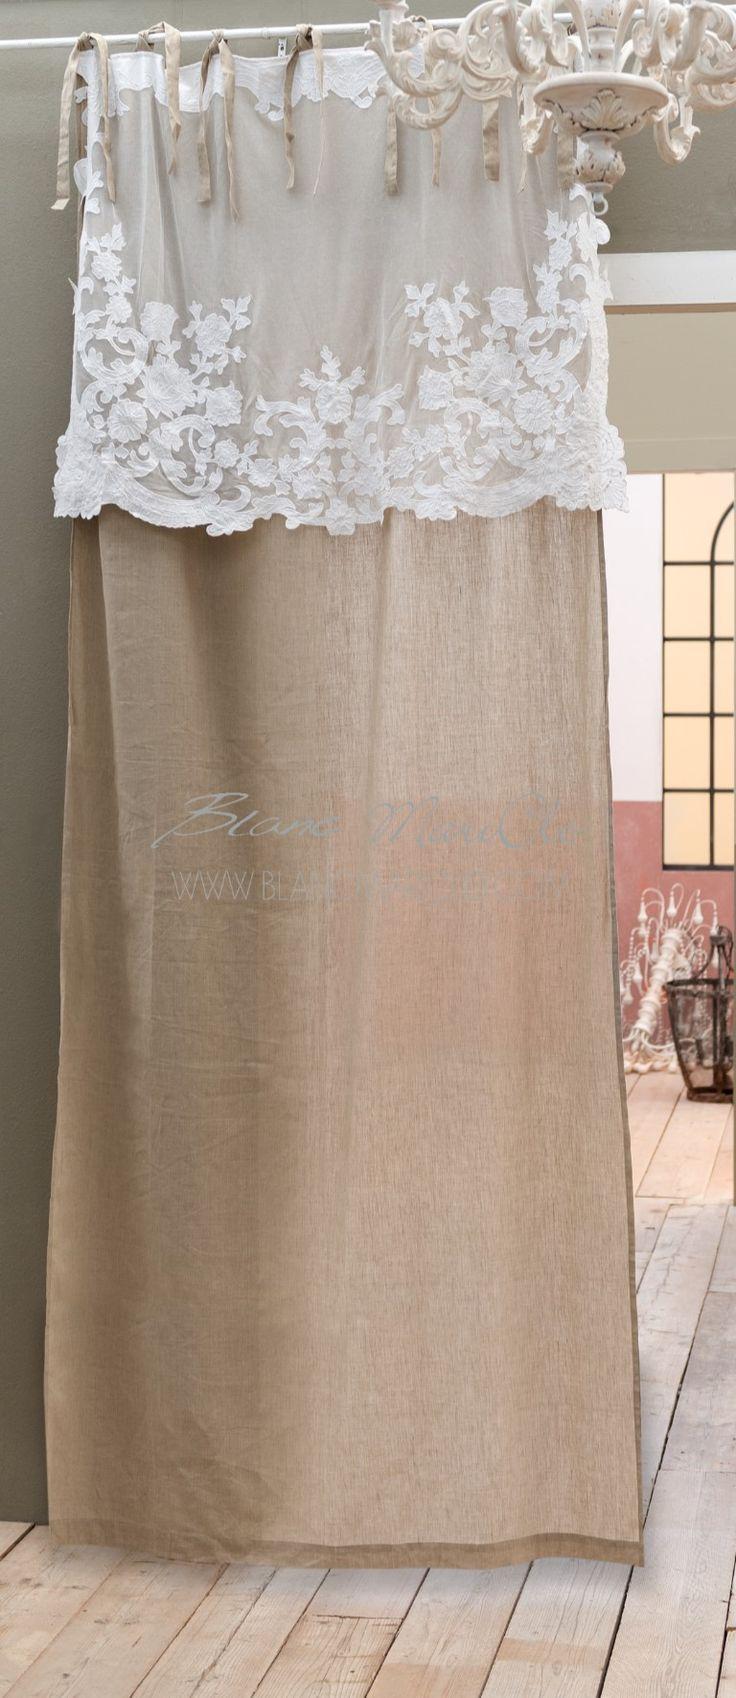 "Tenda con mantovana ""Arabella Collection"" Blanc Mariclò | Petit Rêve"